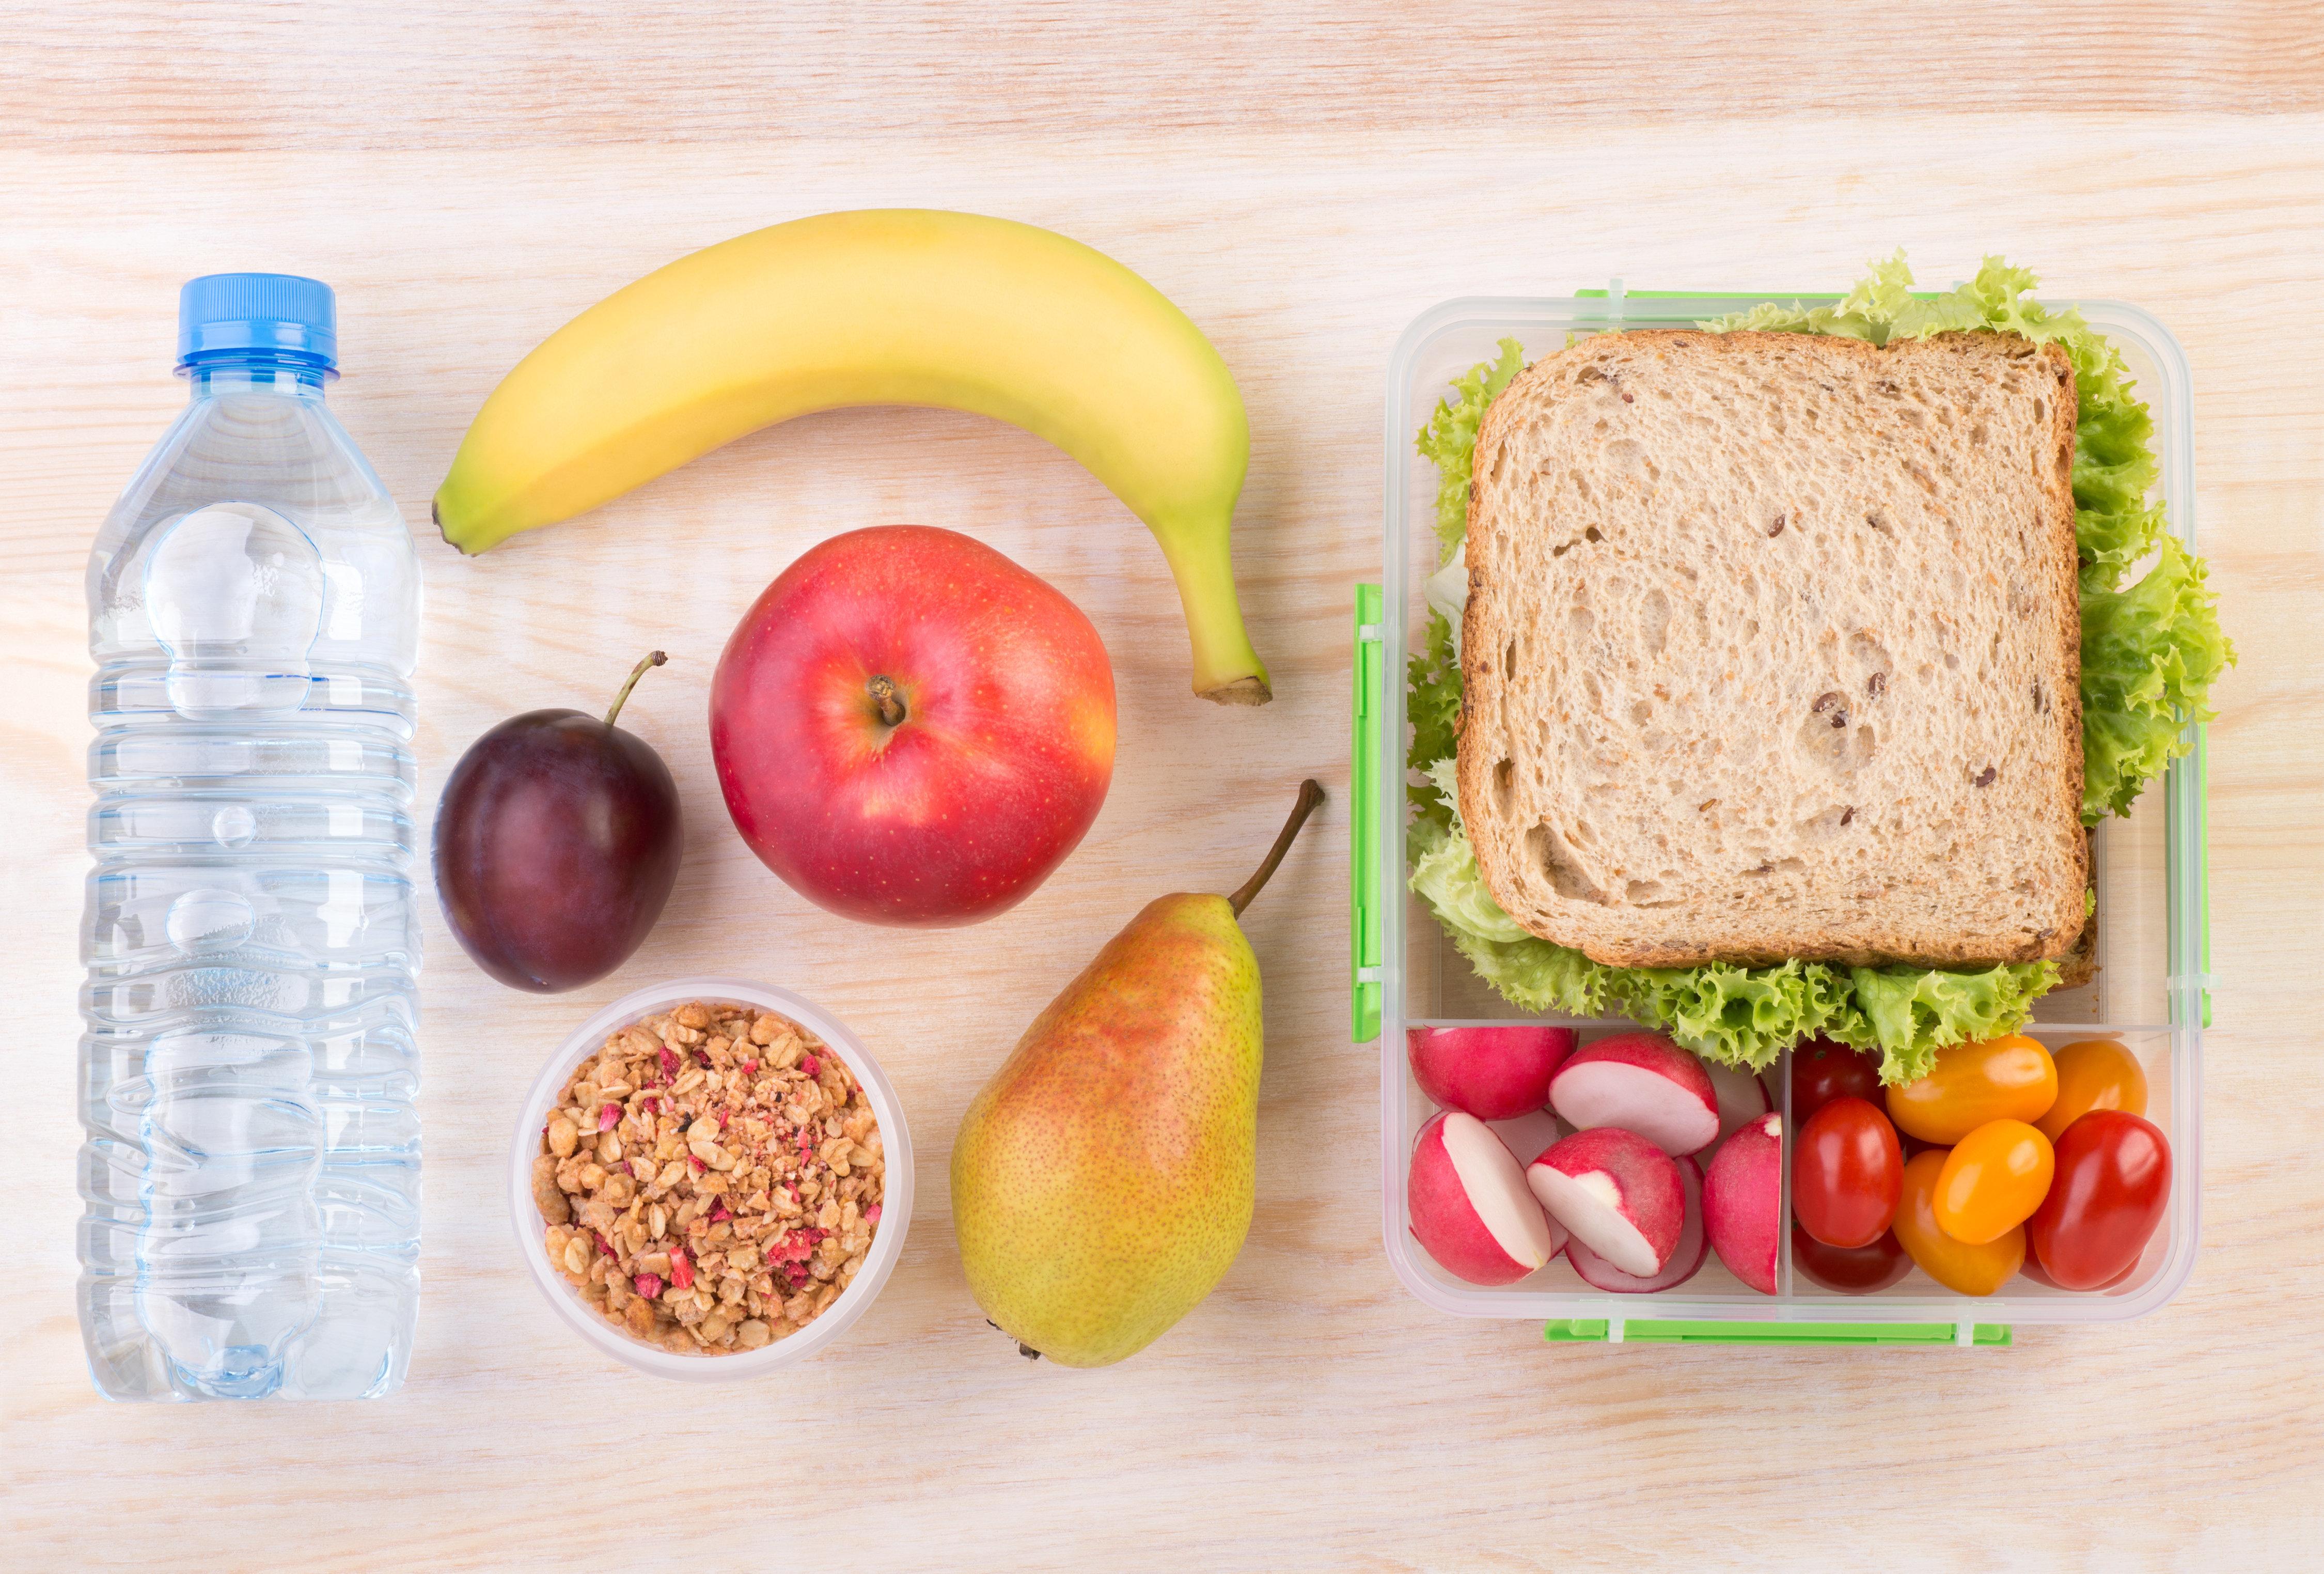 чем можно перекусить на диете на работе